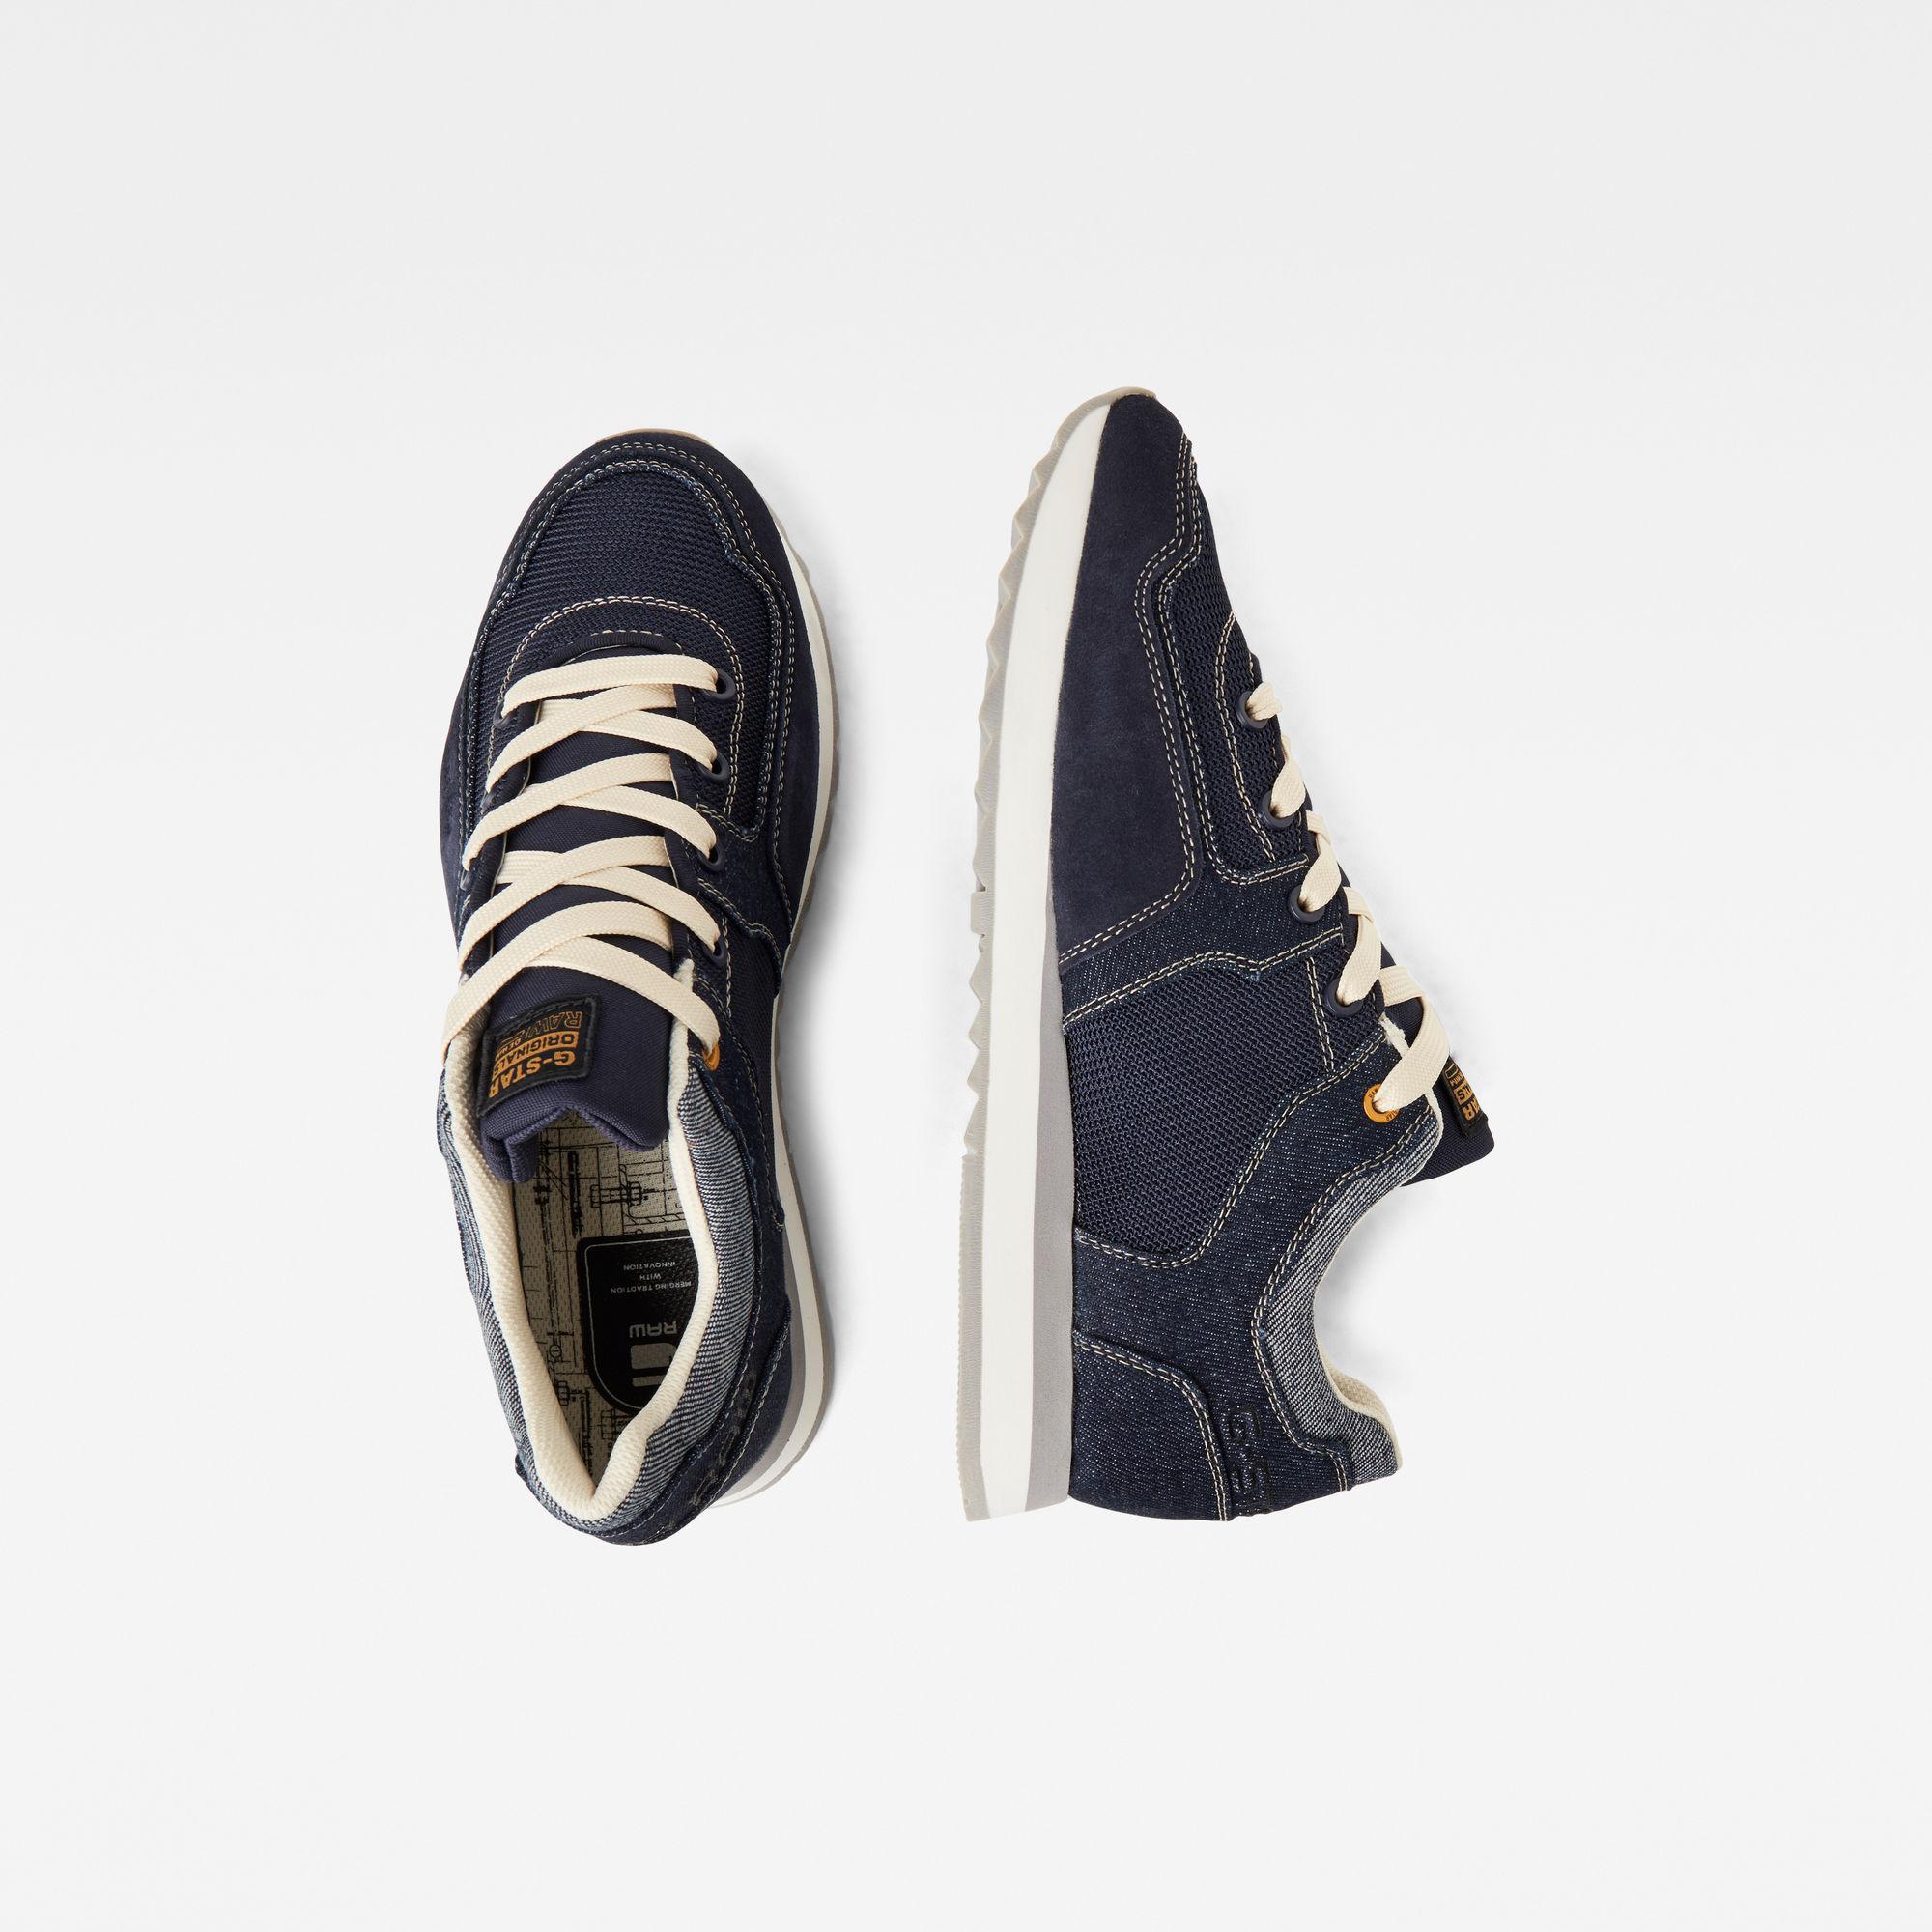 Calow Denim II Sneakers